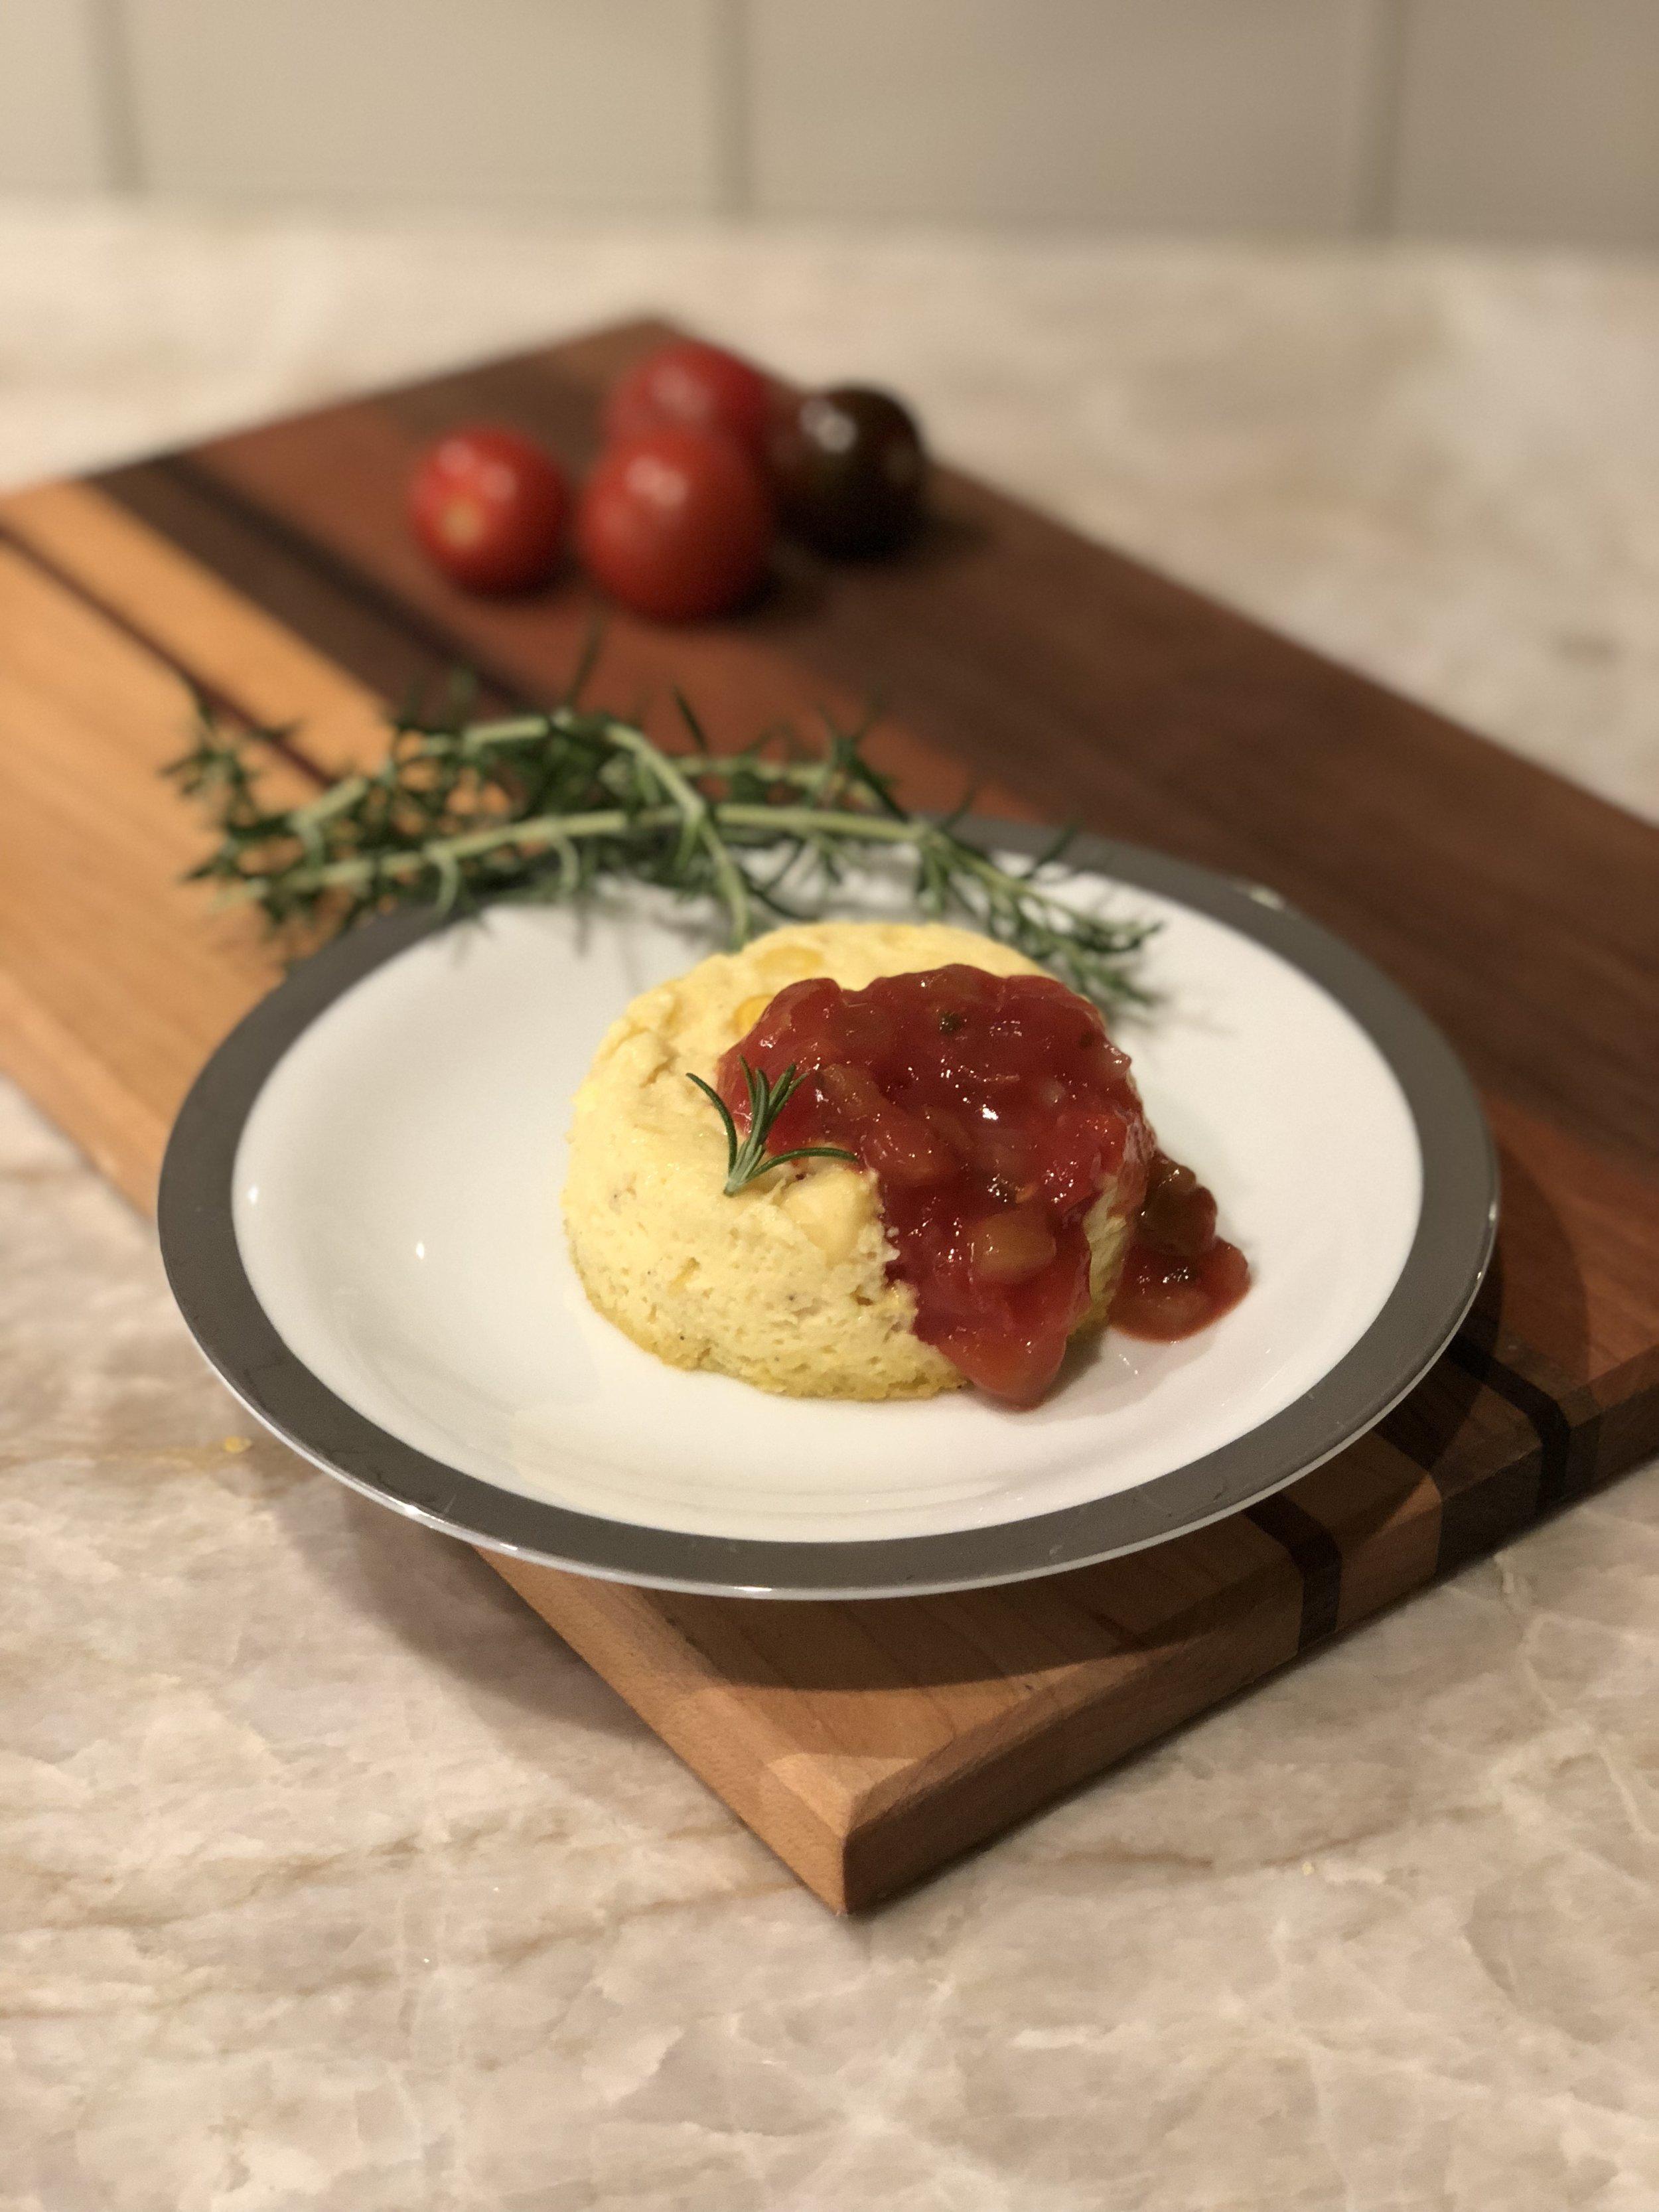 Timbale de Maïs frais avec sauce tomatoe Provençle  (Fresh Corn Timbale with Provencal Tomato Sauce)